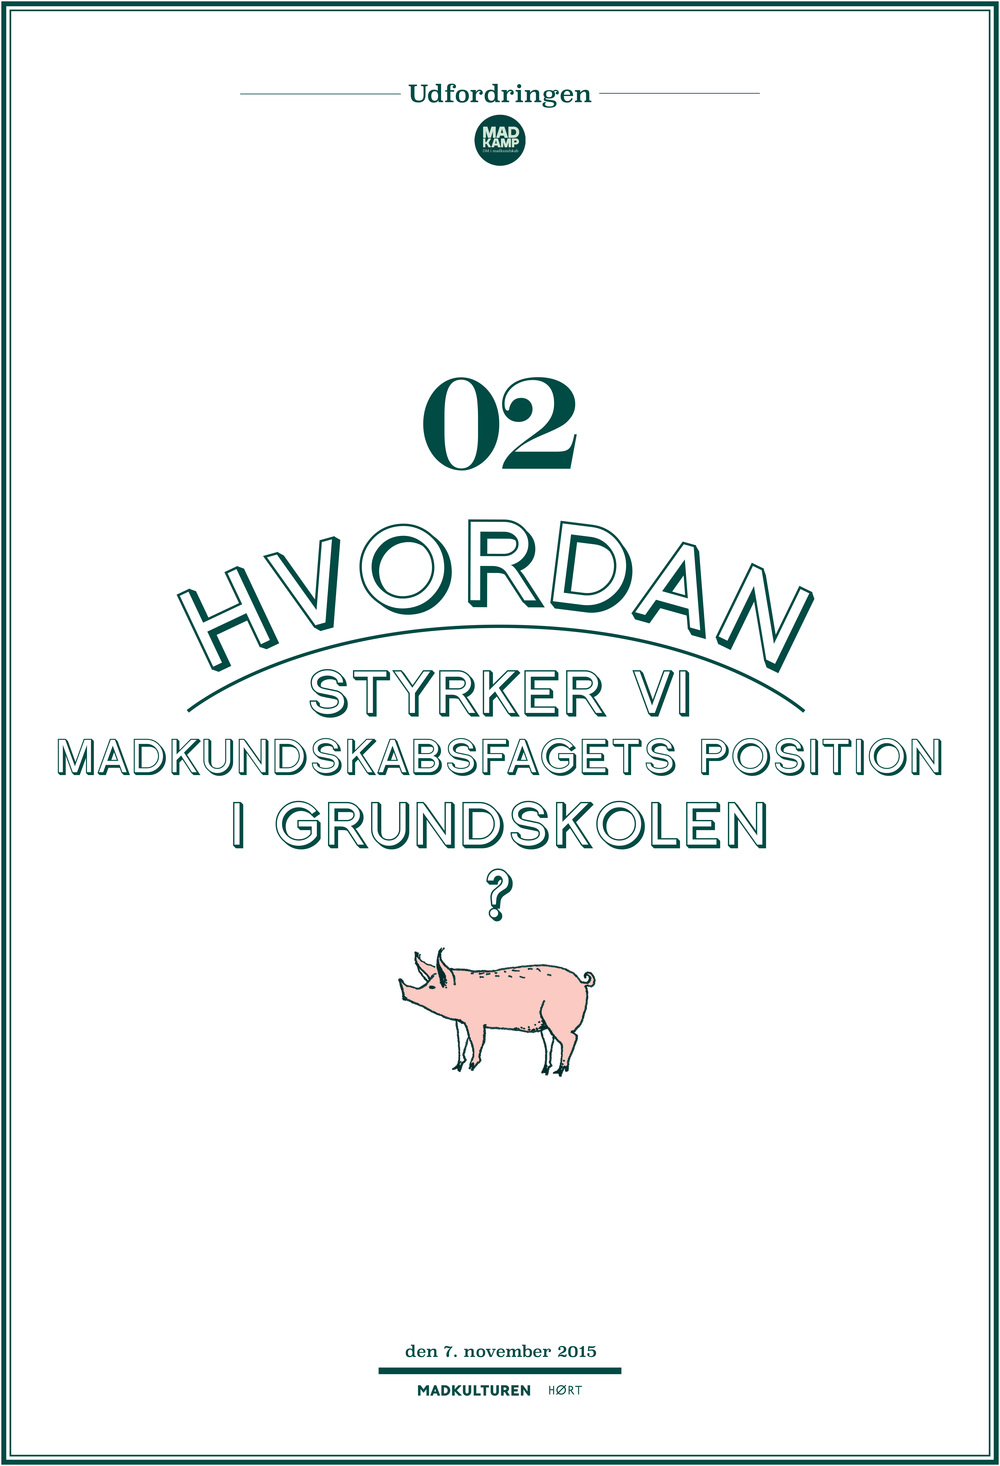 Madkamp_A1-02_Udfordringer-2.jpg